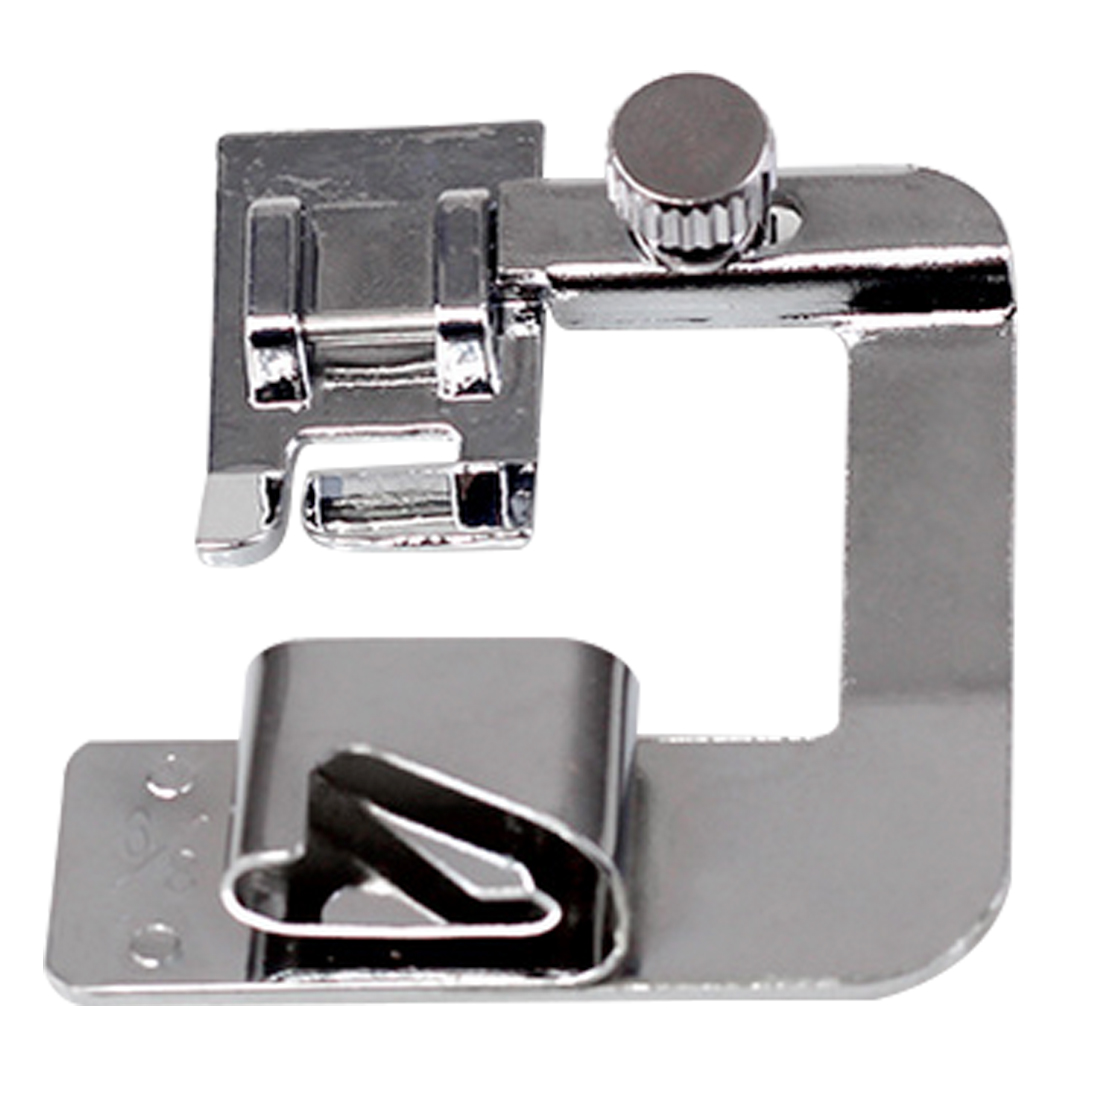 Presser Fuß Overlock Nähmaschine Zubehör Nähfuß Haushaltsnähmaschine Teile Nähen